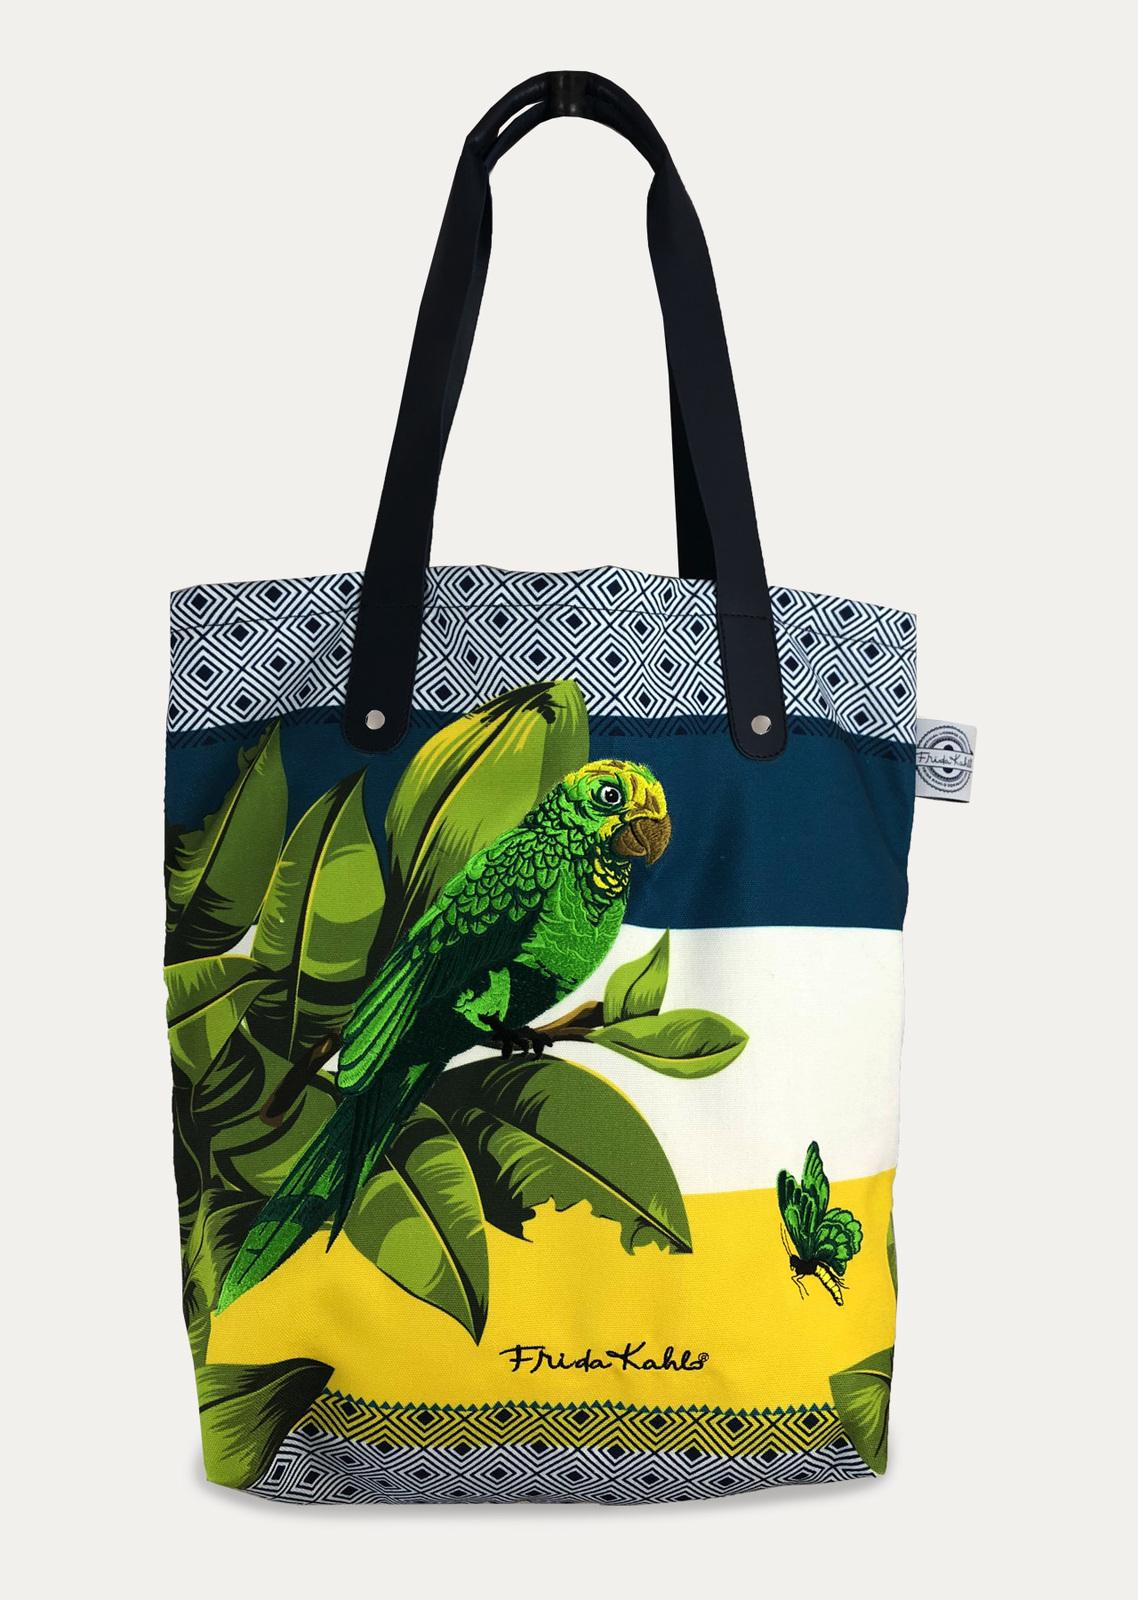 Frida Kahlo - Bonito Tote Bag with Pom Poms image